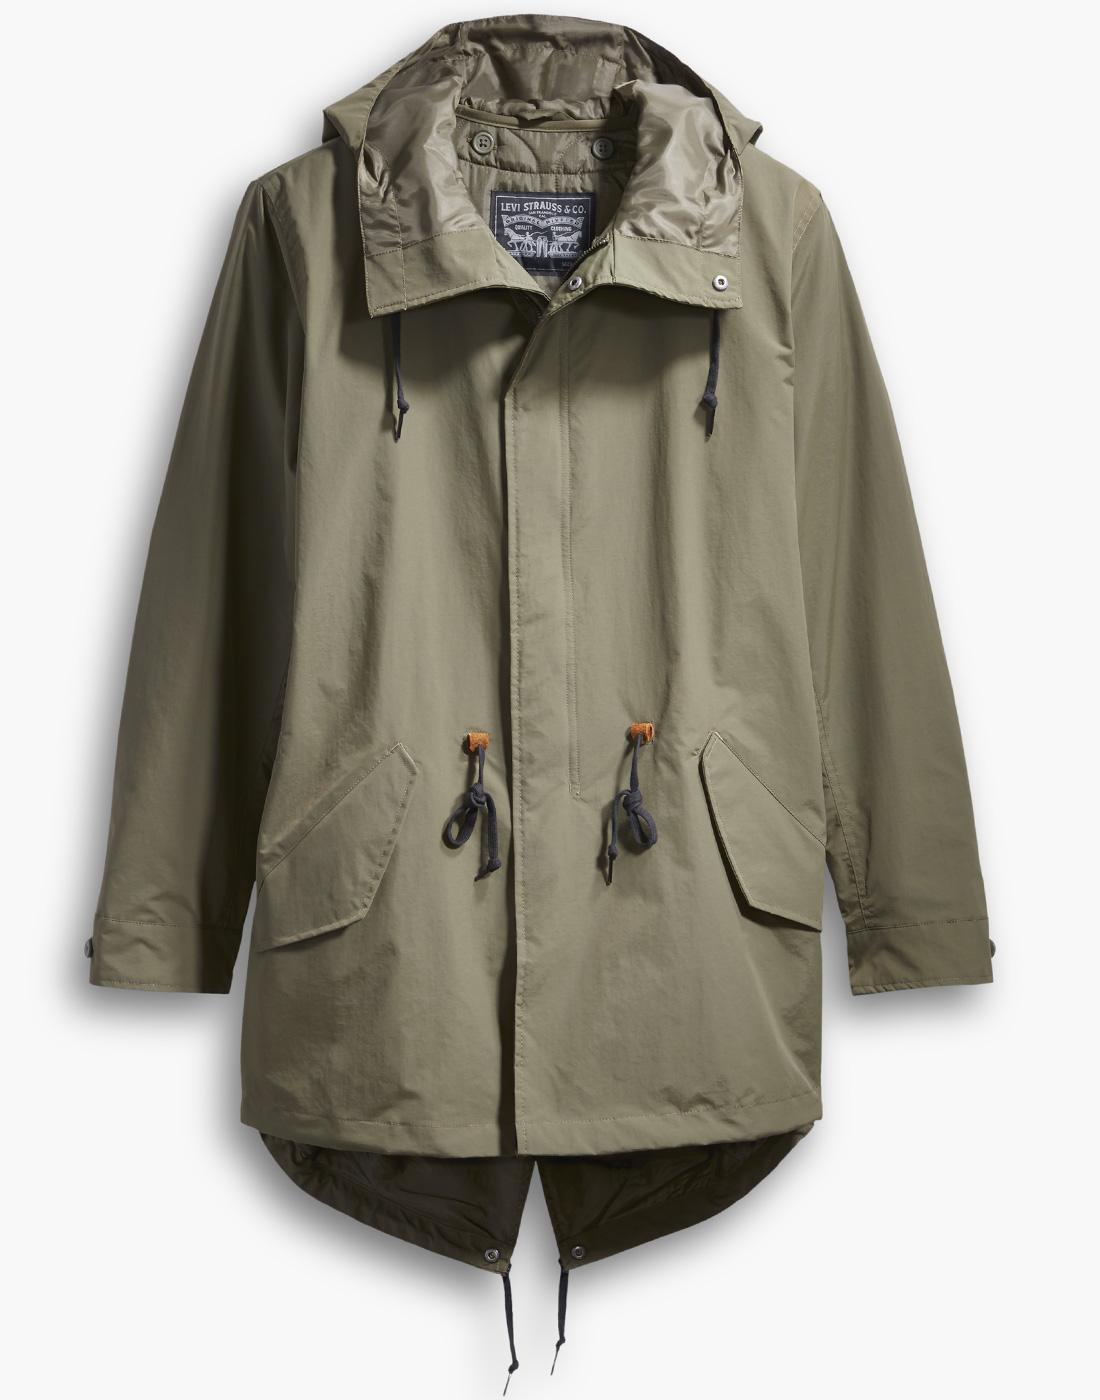 LEVI'S Mens Retro Mod 3 in 1 Fishtail Parka Jacket